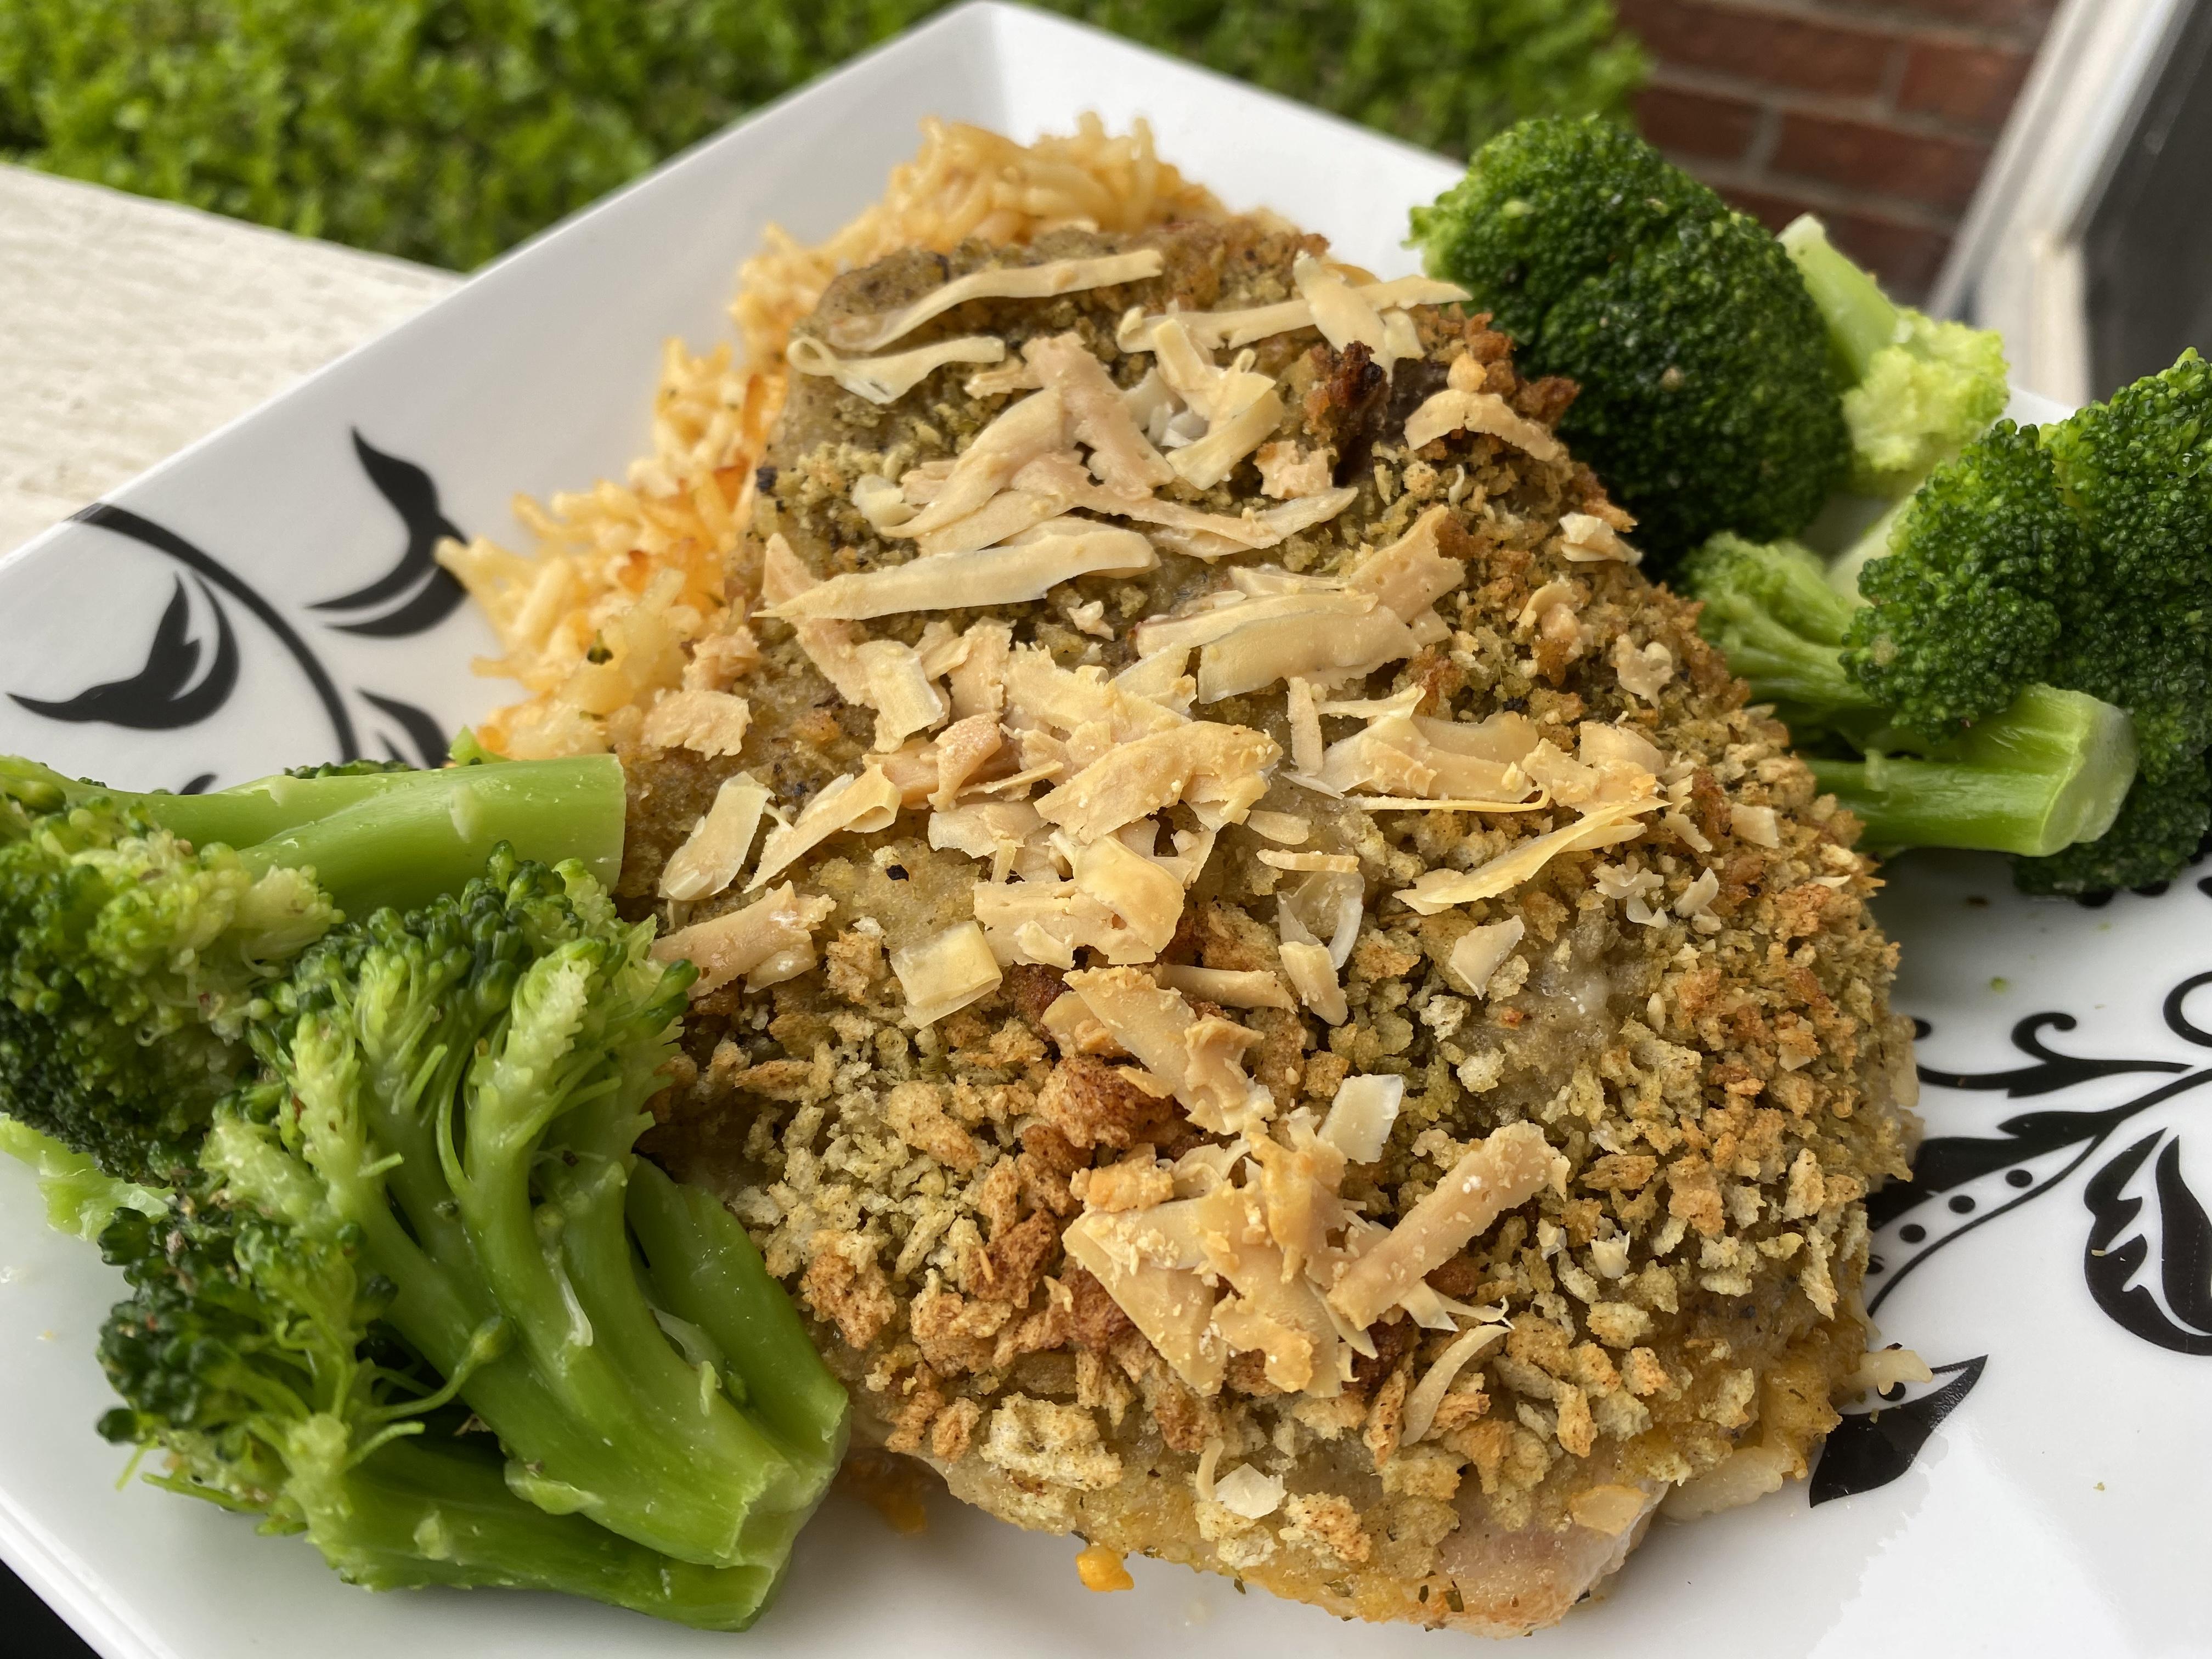 Garlic-Herb-Crusted Pork Chop Dinner for One